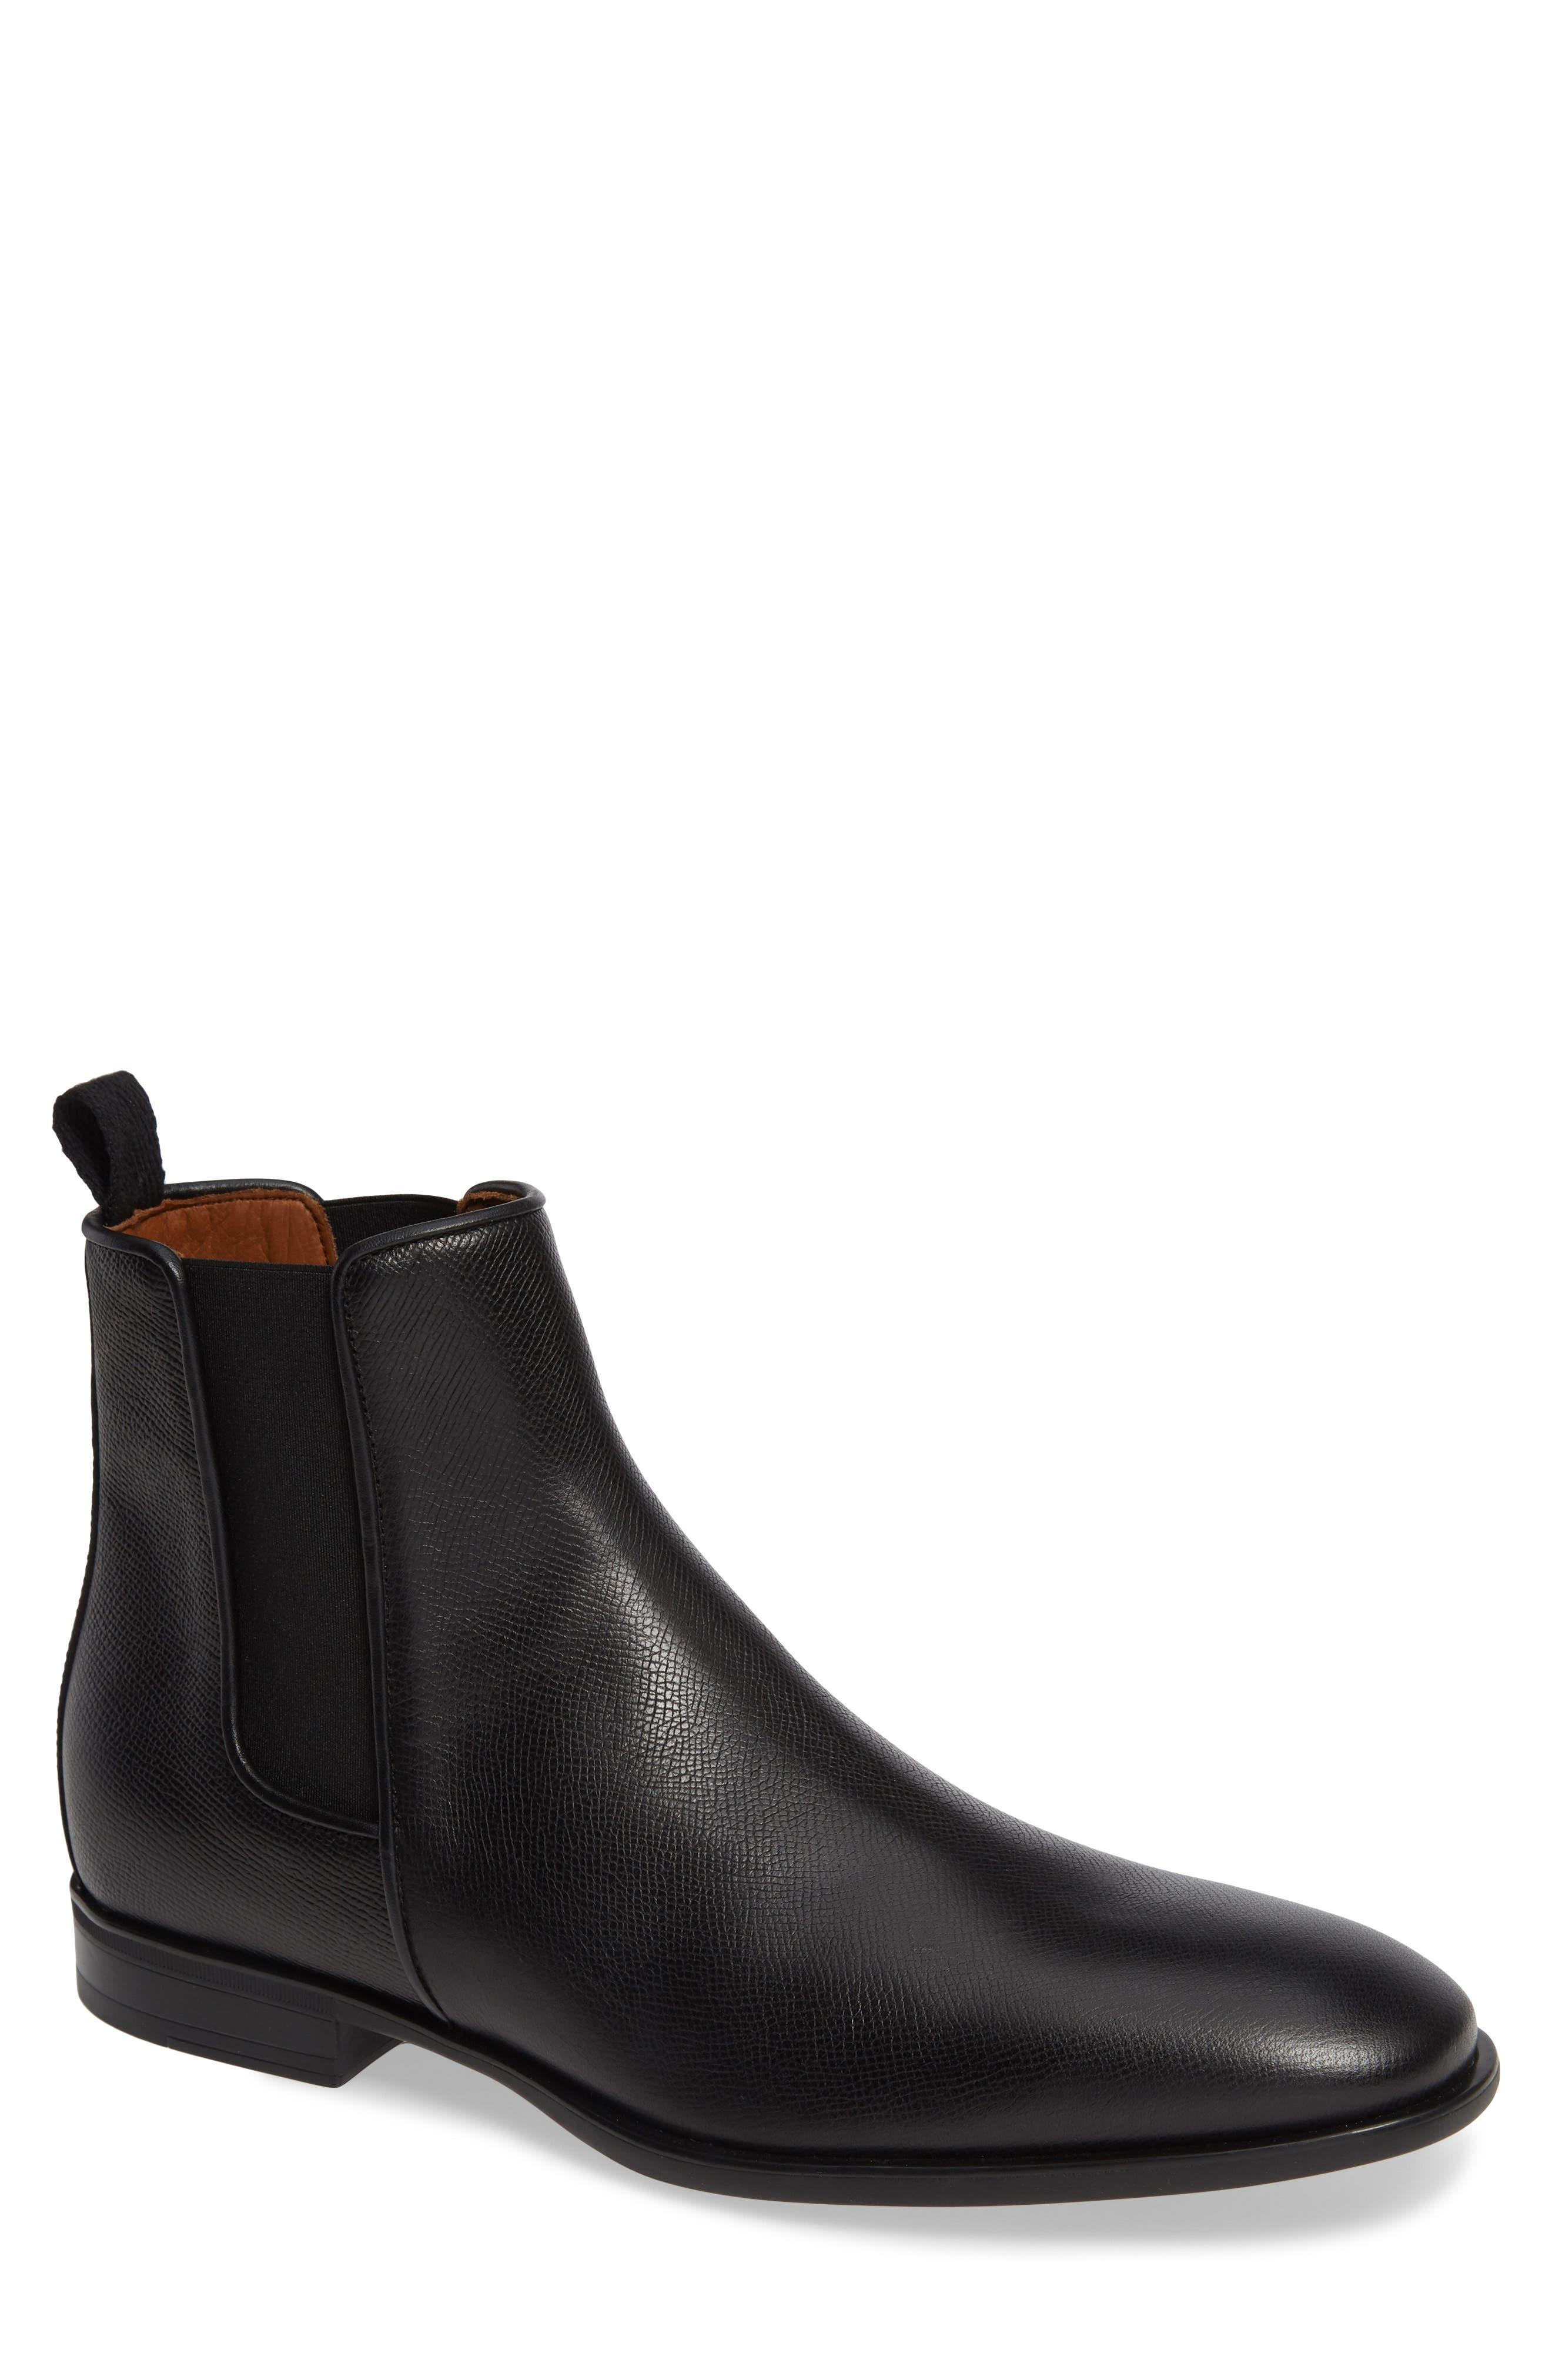 AQUATALIA, 'Adrian' Water Resistant Chelsea Boot, Main thumbnail 1, color, BLACK/ BLACK